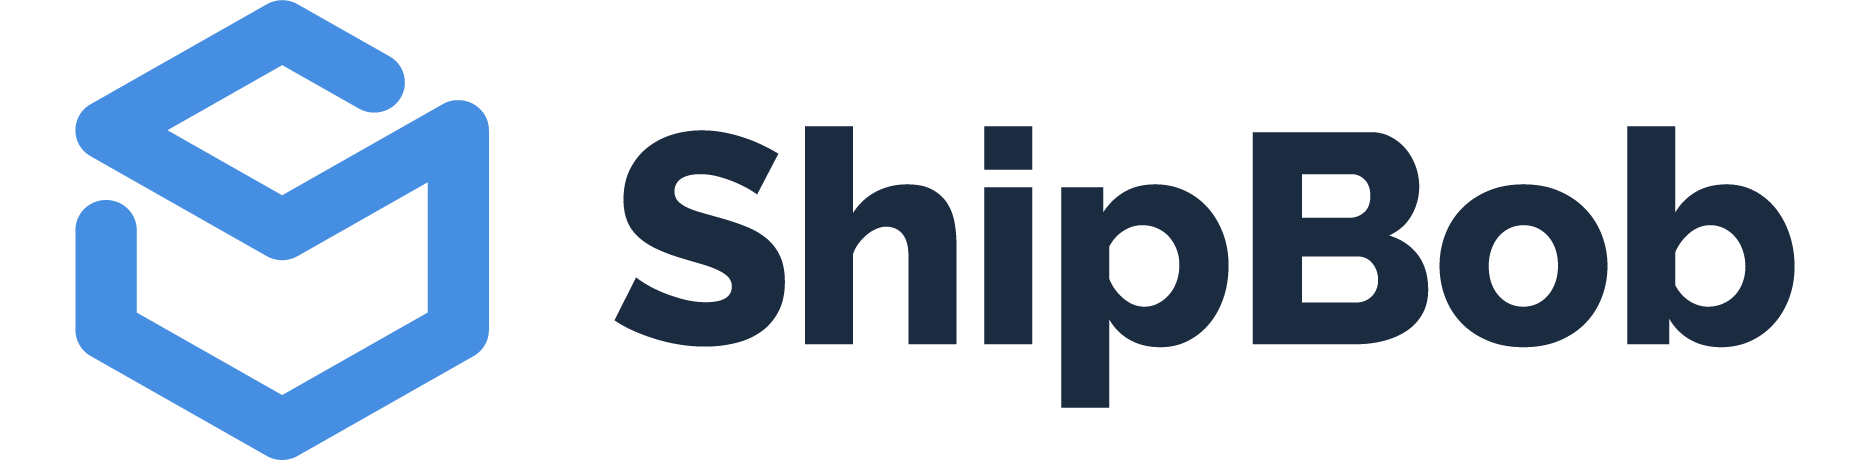 Shipbob1.png